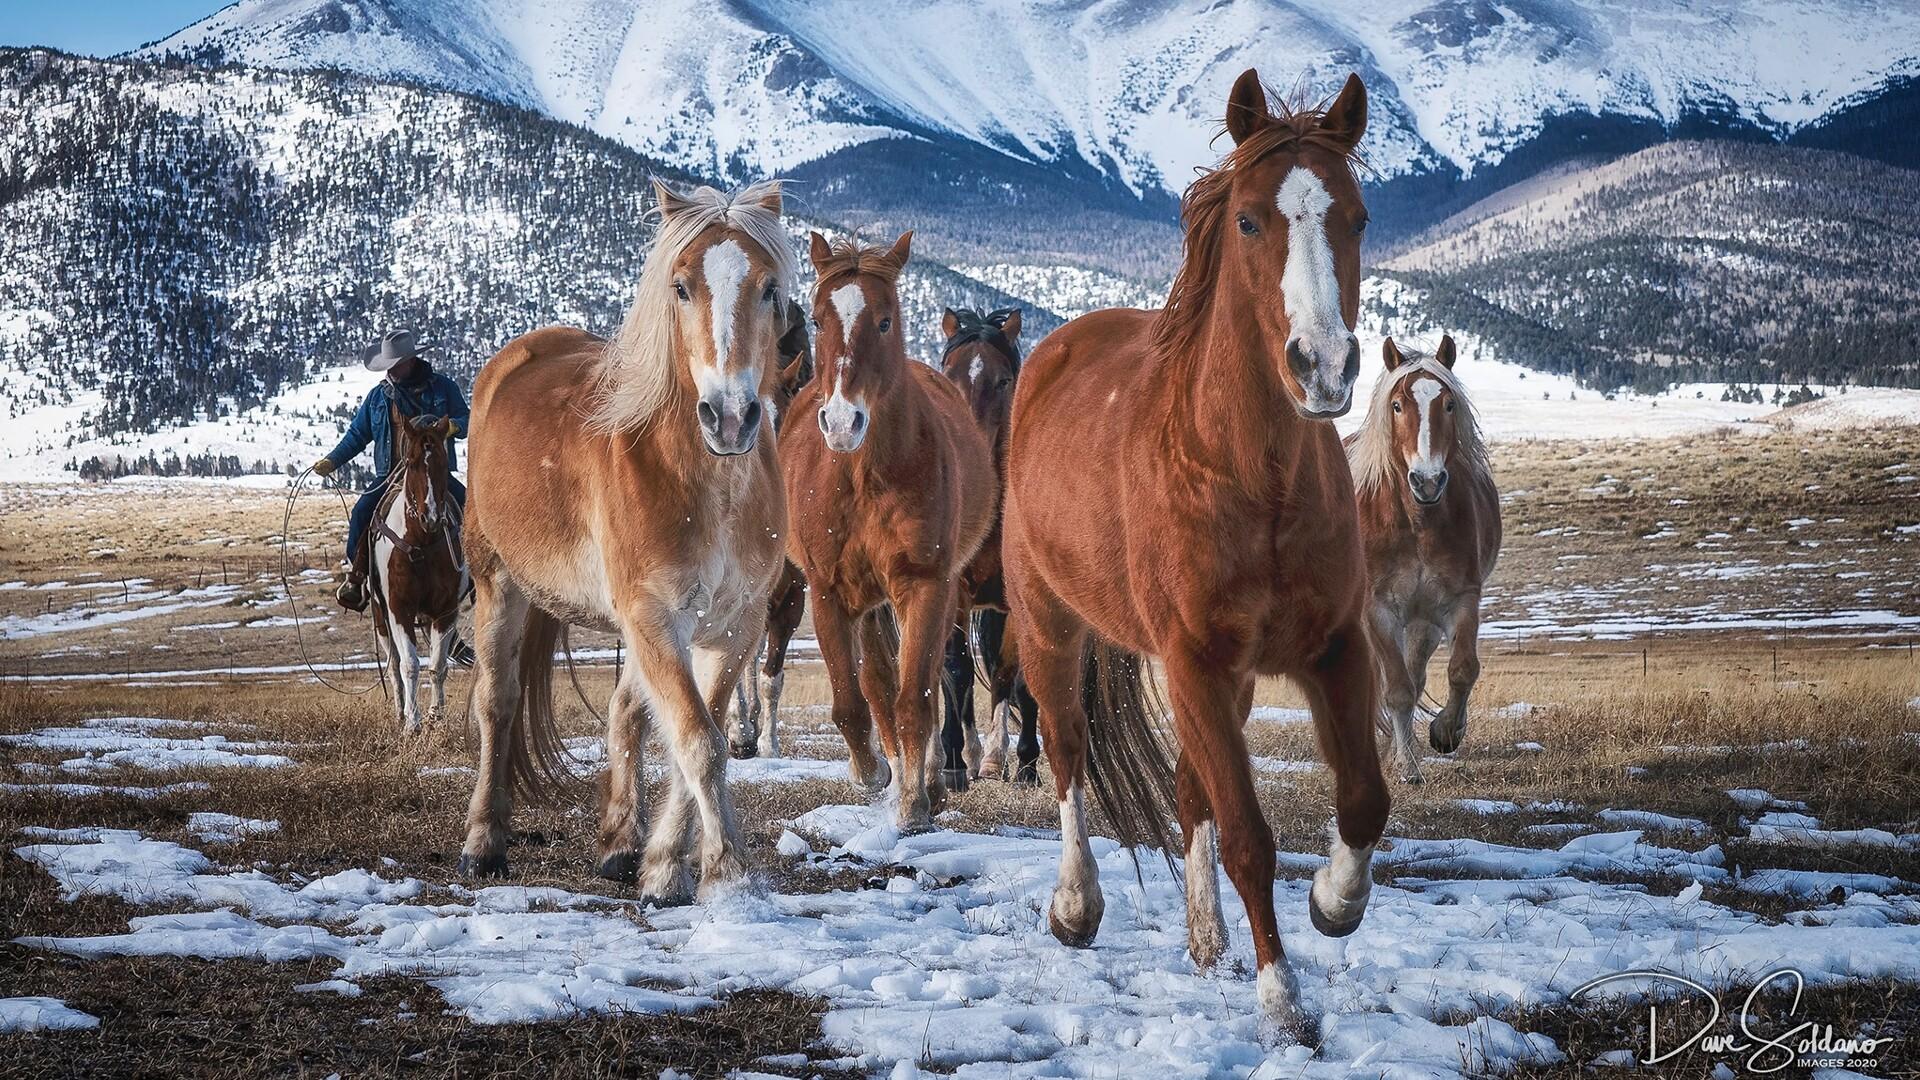 Horses running in Westcliffe David Soldano Photography.jpg